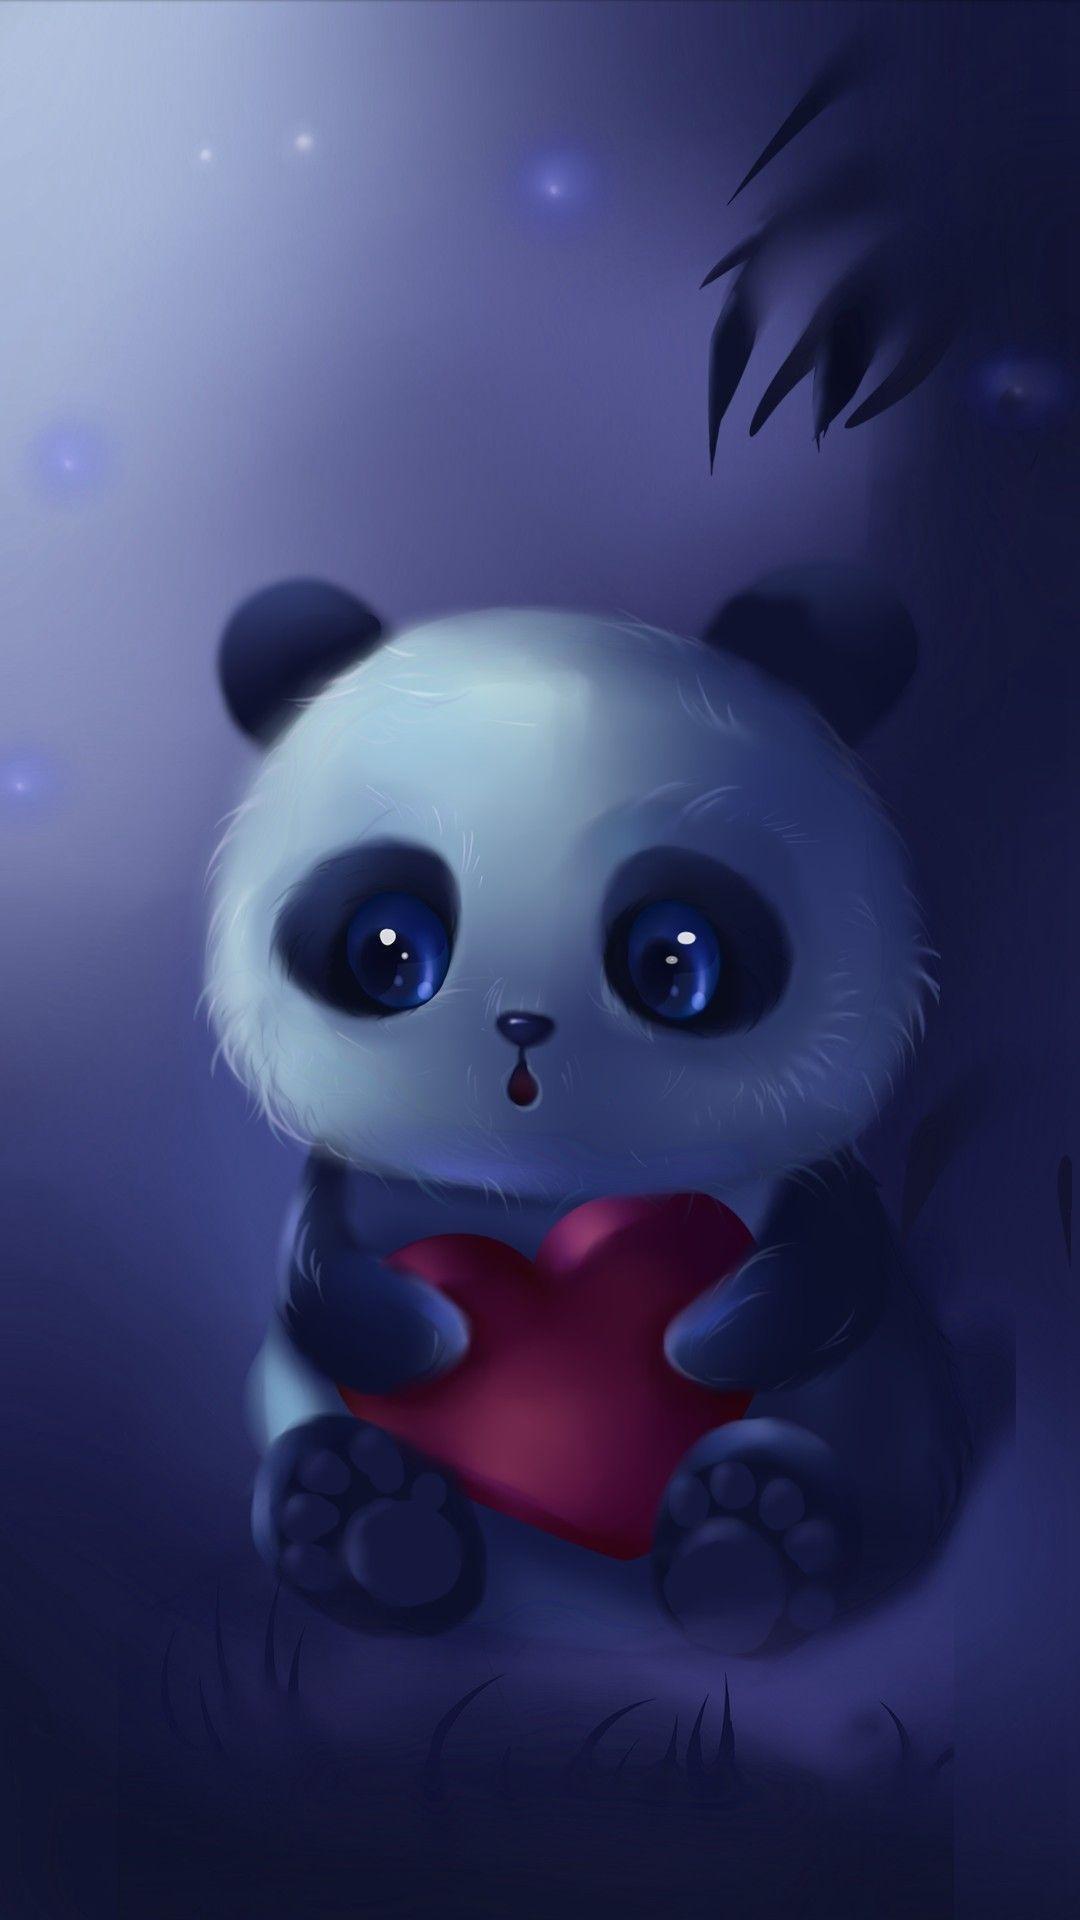 Hintergrunde Teddybar Herz Harfler Hintergrundbilder Hintergrundbilderiph In 2021 Panda Art Cute Panda Wallpaper Cute Animal Drawings